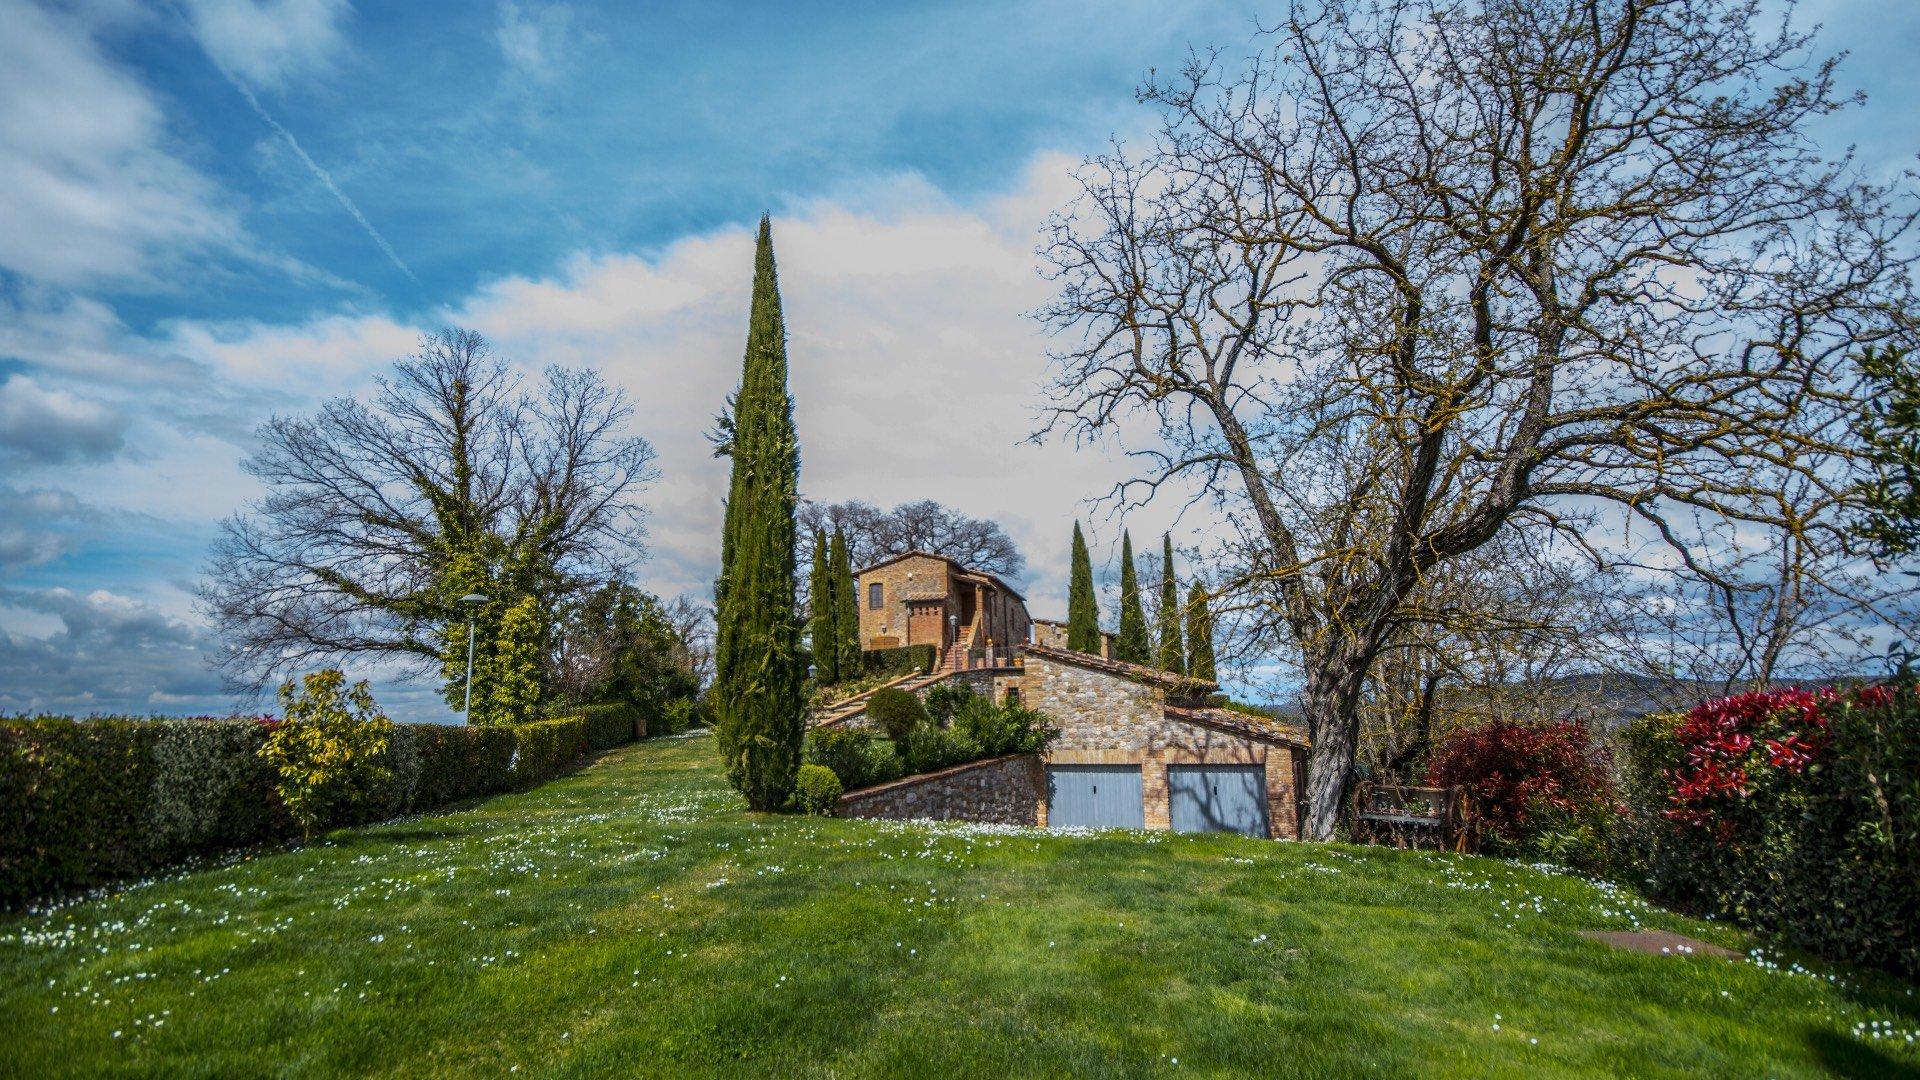 Farm Ranch in Umbria, Italy 1